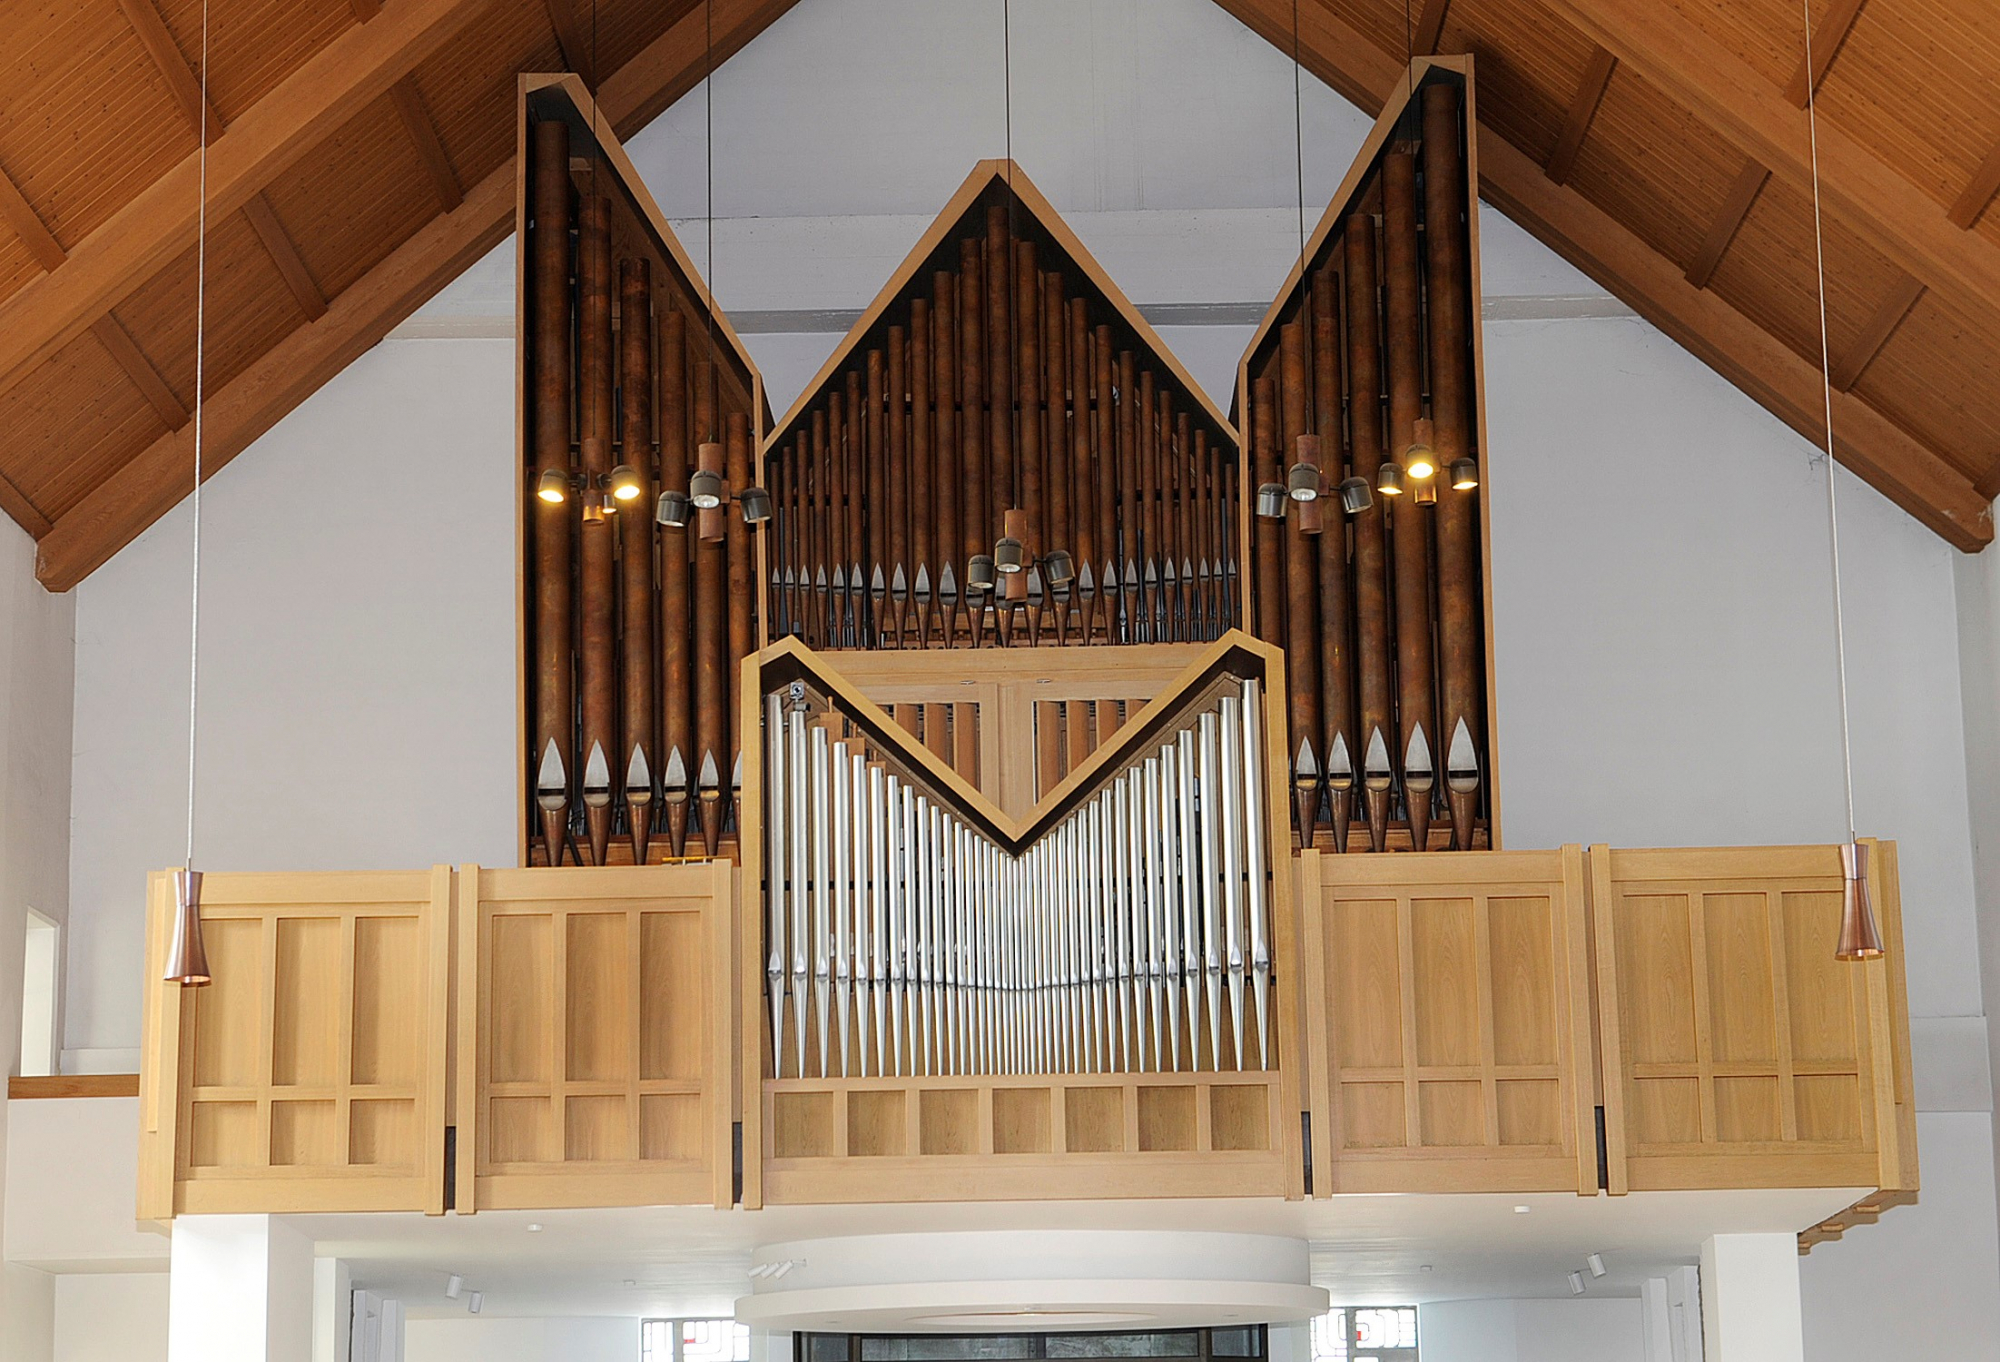 Stko_kirche_orgel-5